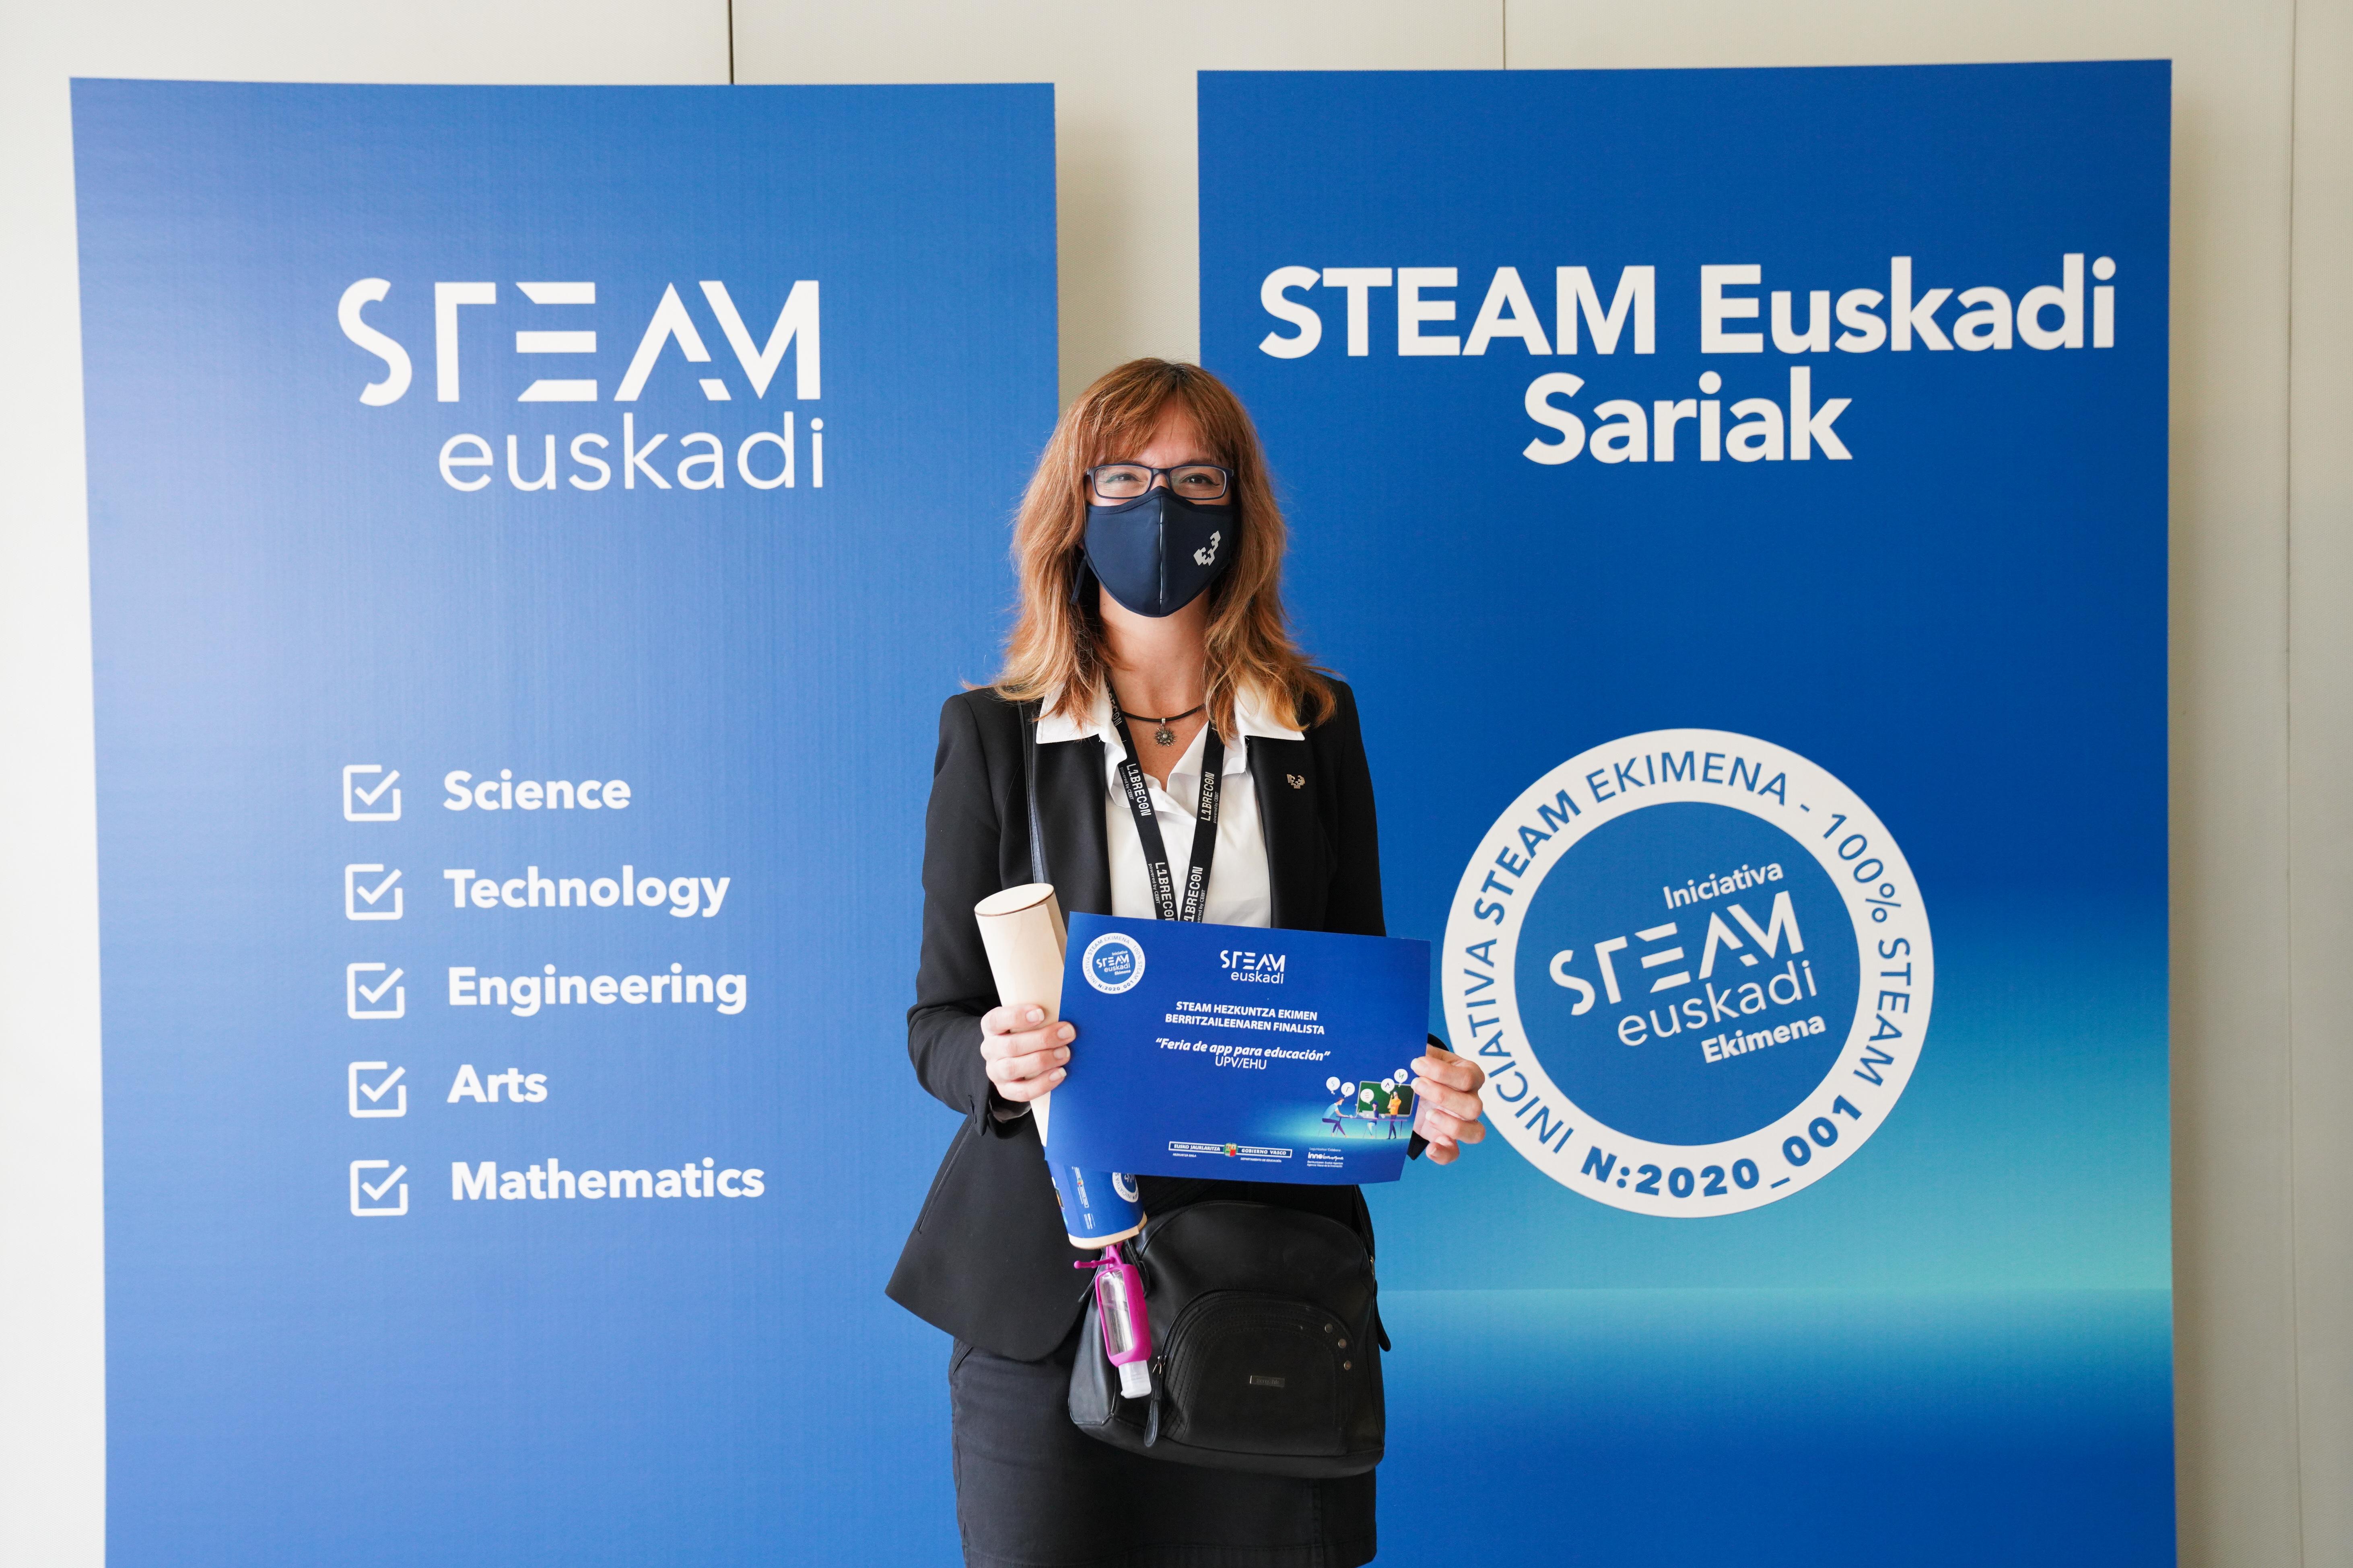 STEAM_Euskadi_Sariak__11_.jpg